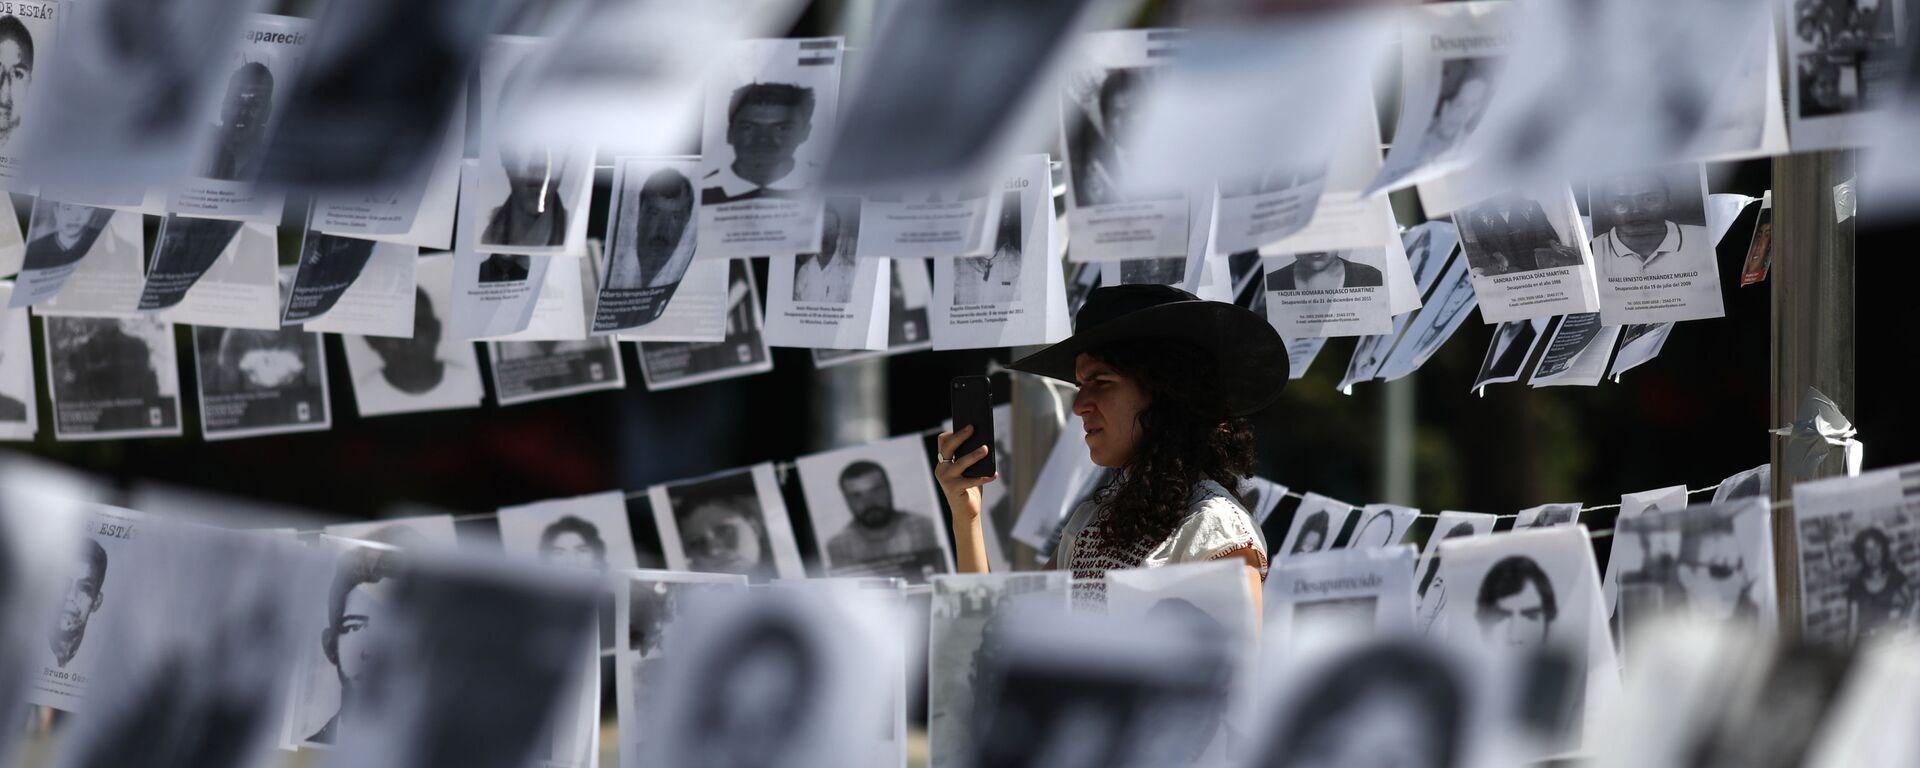 Fotos de desaparecidos en México (imagen referencial) - Sputnik Mundo, 1920, 01.06.2021